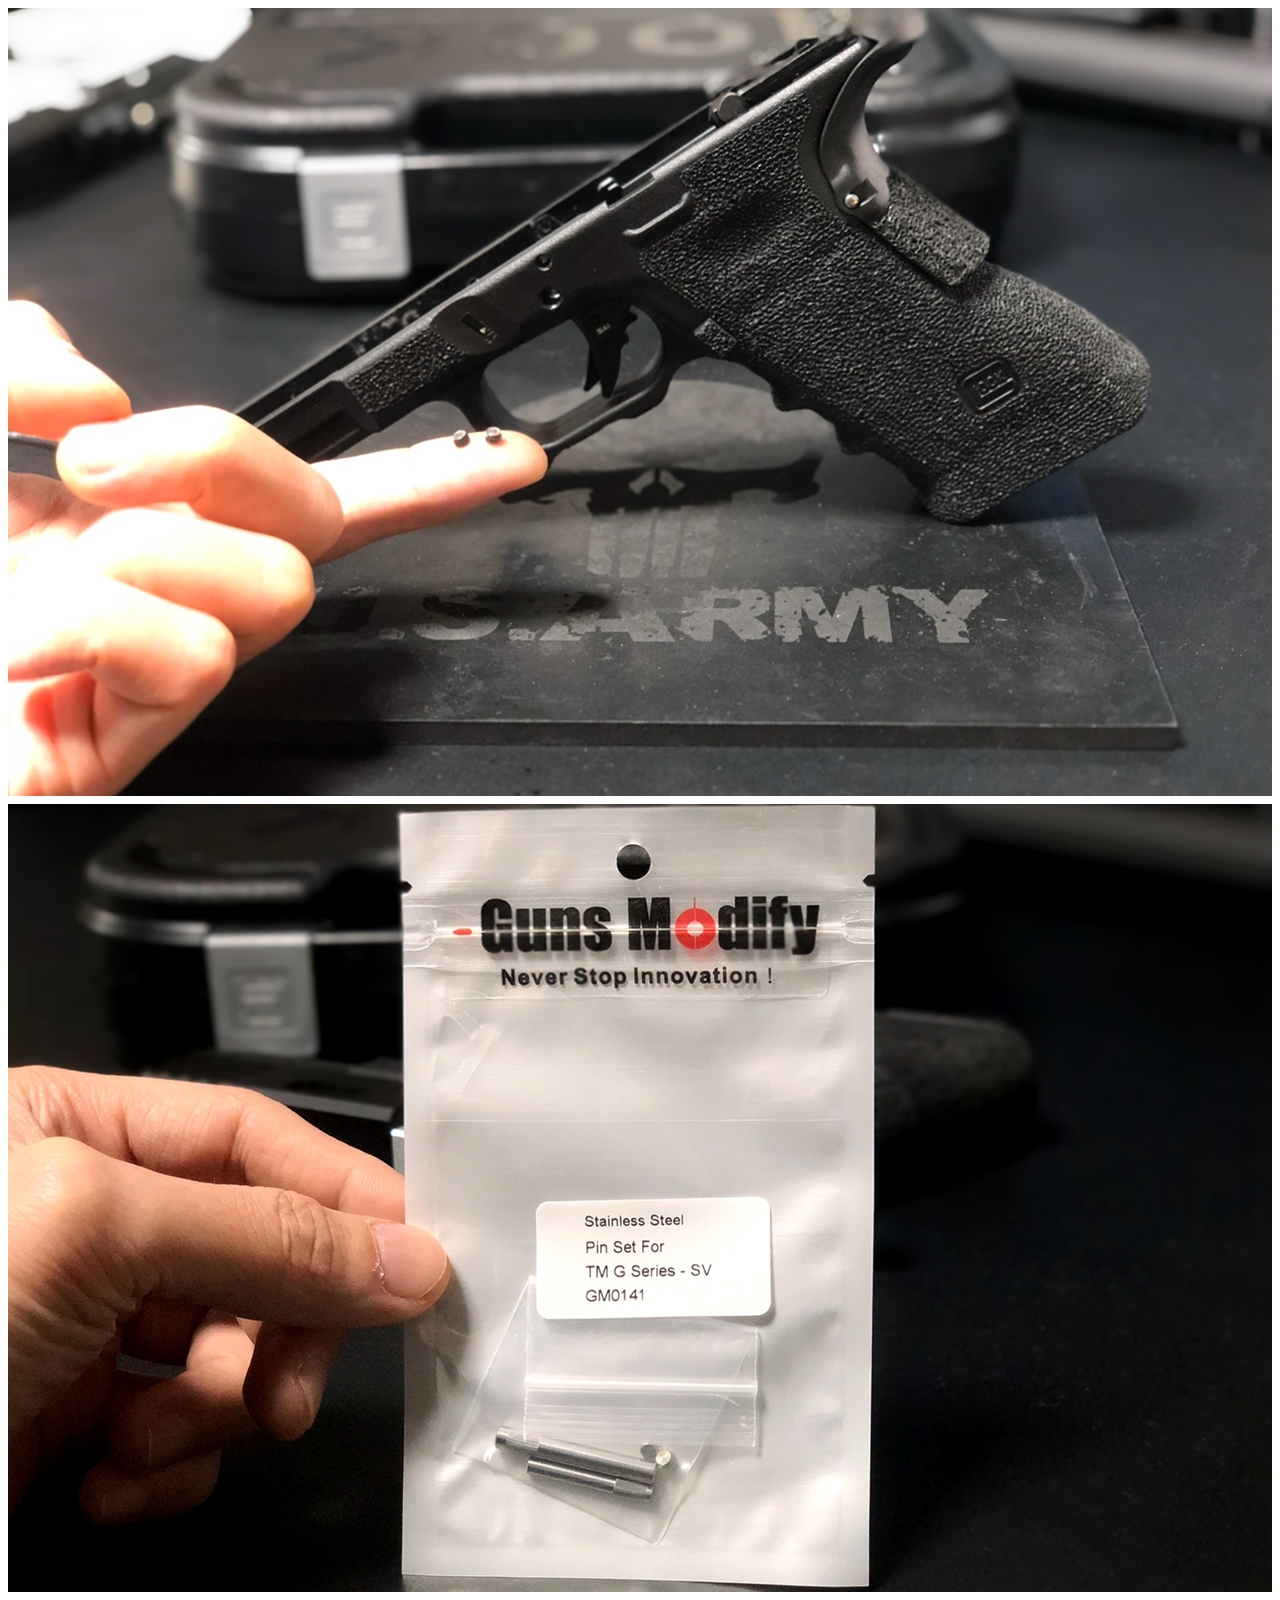 6 GLOCK G18C カスタムしたるぞー!!続編!! Guns Modify ステンレス フレーム ロックピン & エクステンドスライドロック!! 購入 取付 交換 カスタム レビュー!!